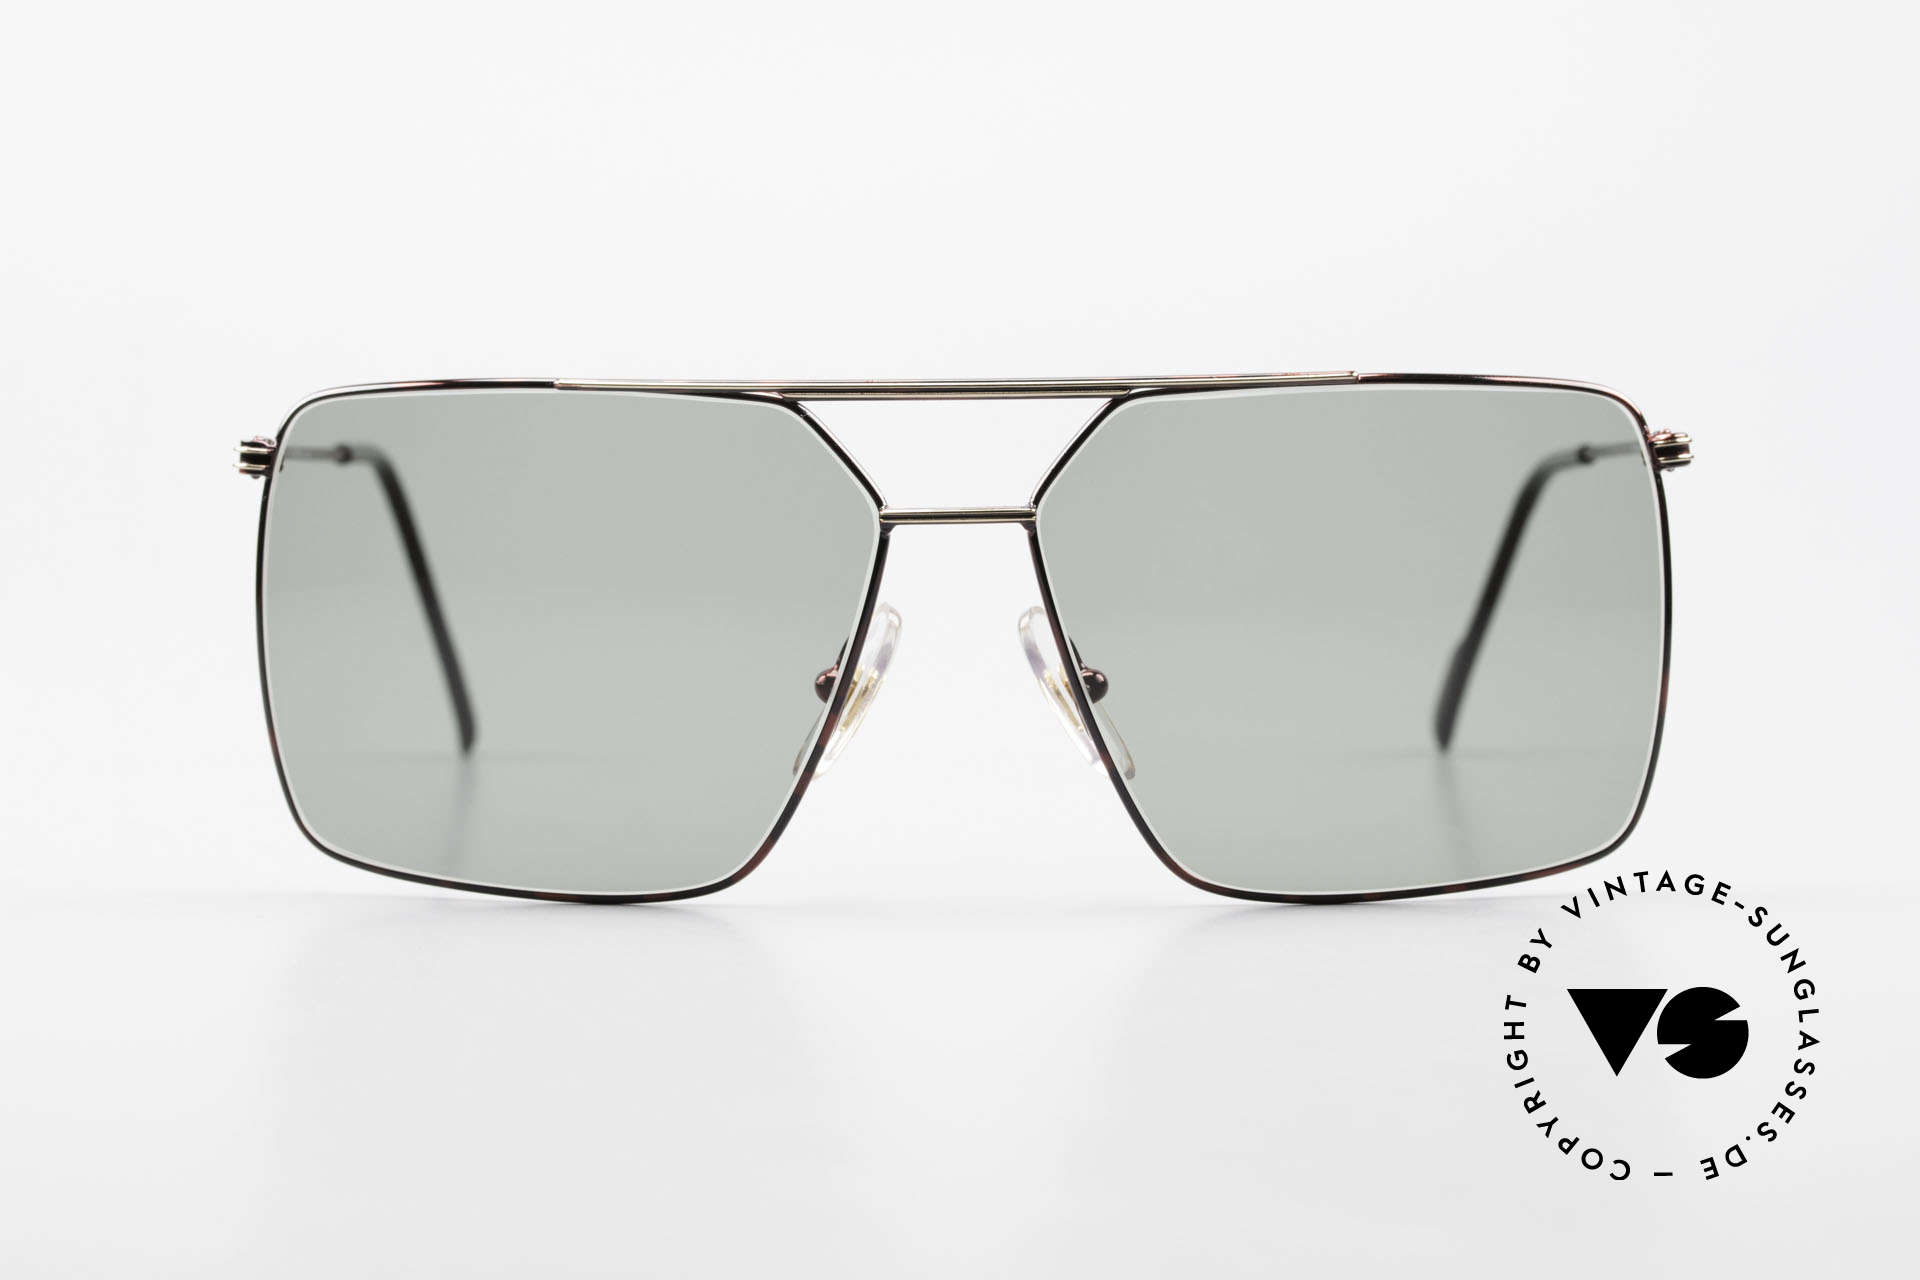 Ferrari F46 Ferrari Formula 1 Sunglasses, lightweight frame; F46, col. 64G, size 59-13, 140, Made for Men